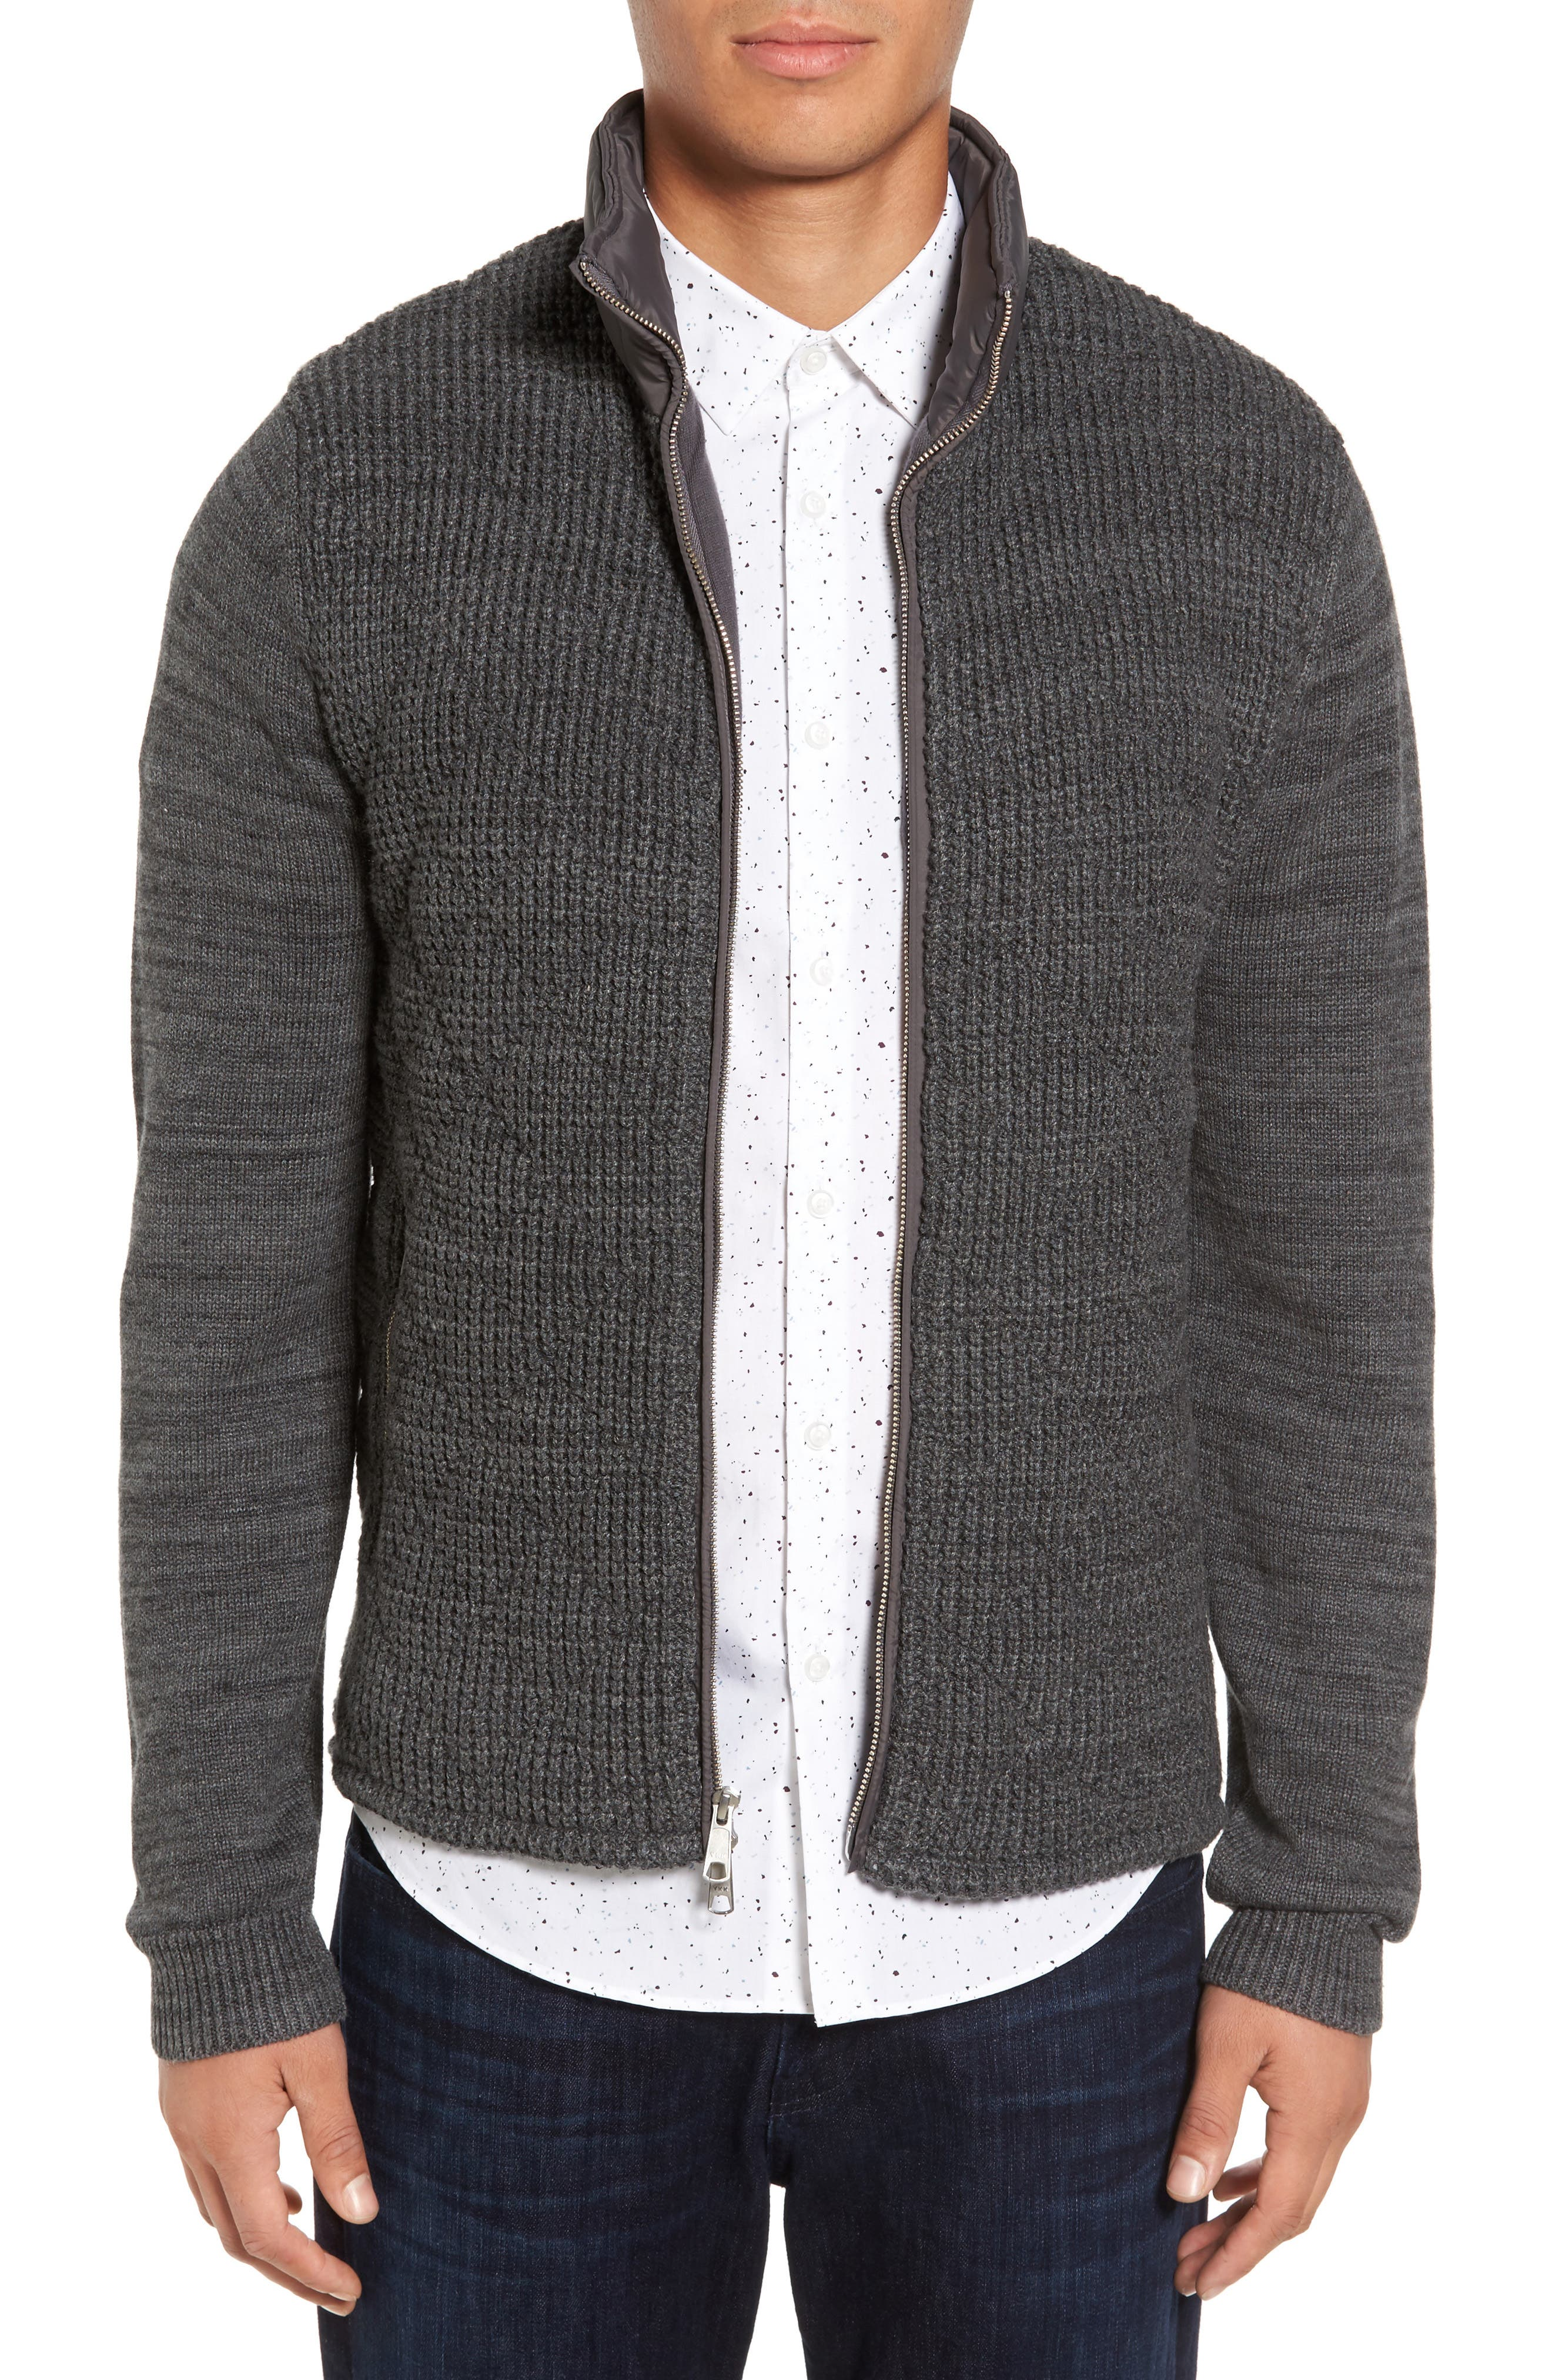 Main Image - Calibrate Mixed Media Full Zip Sweater